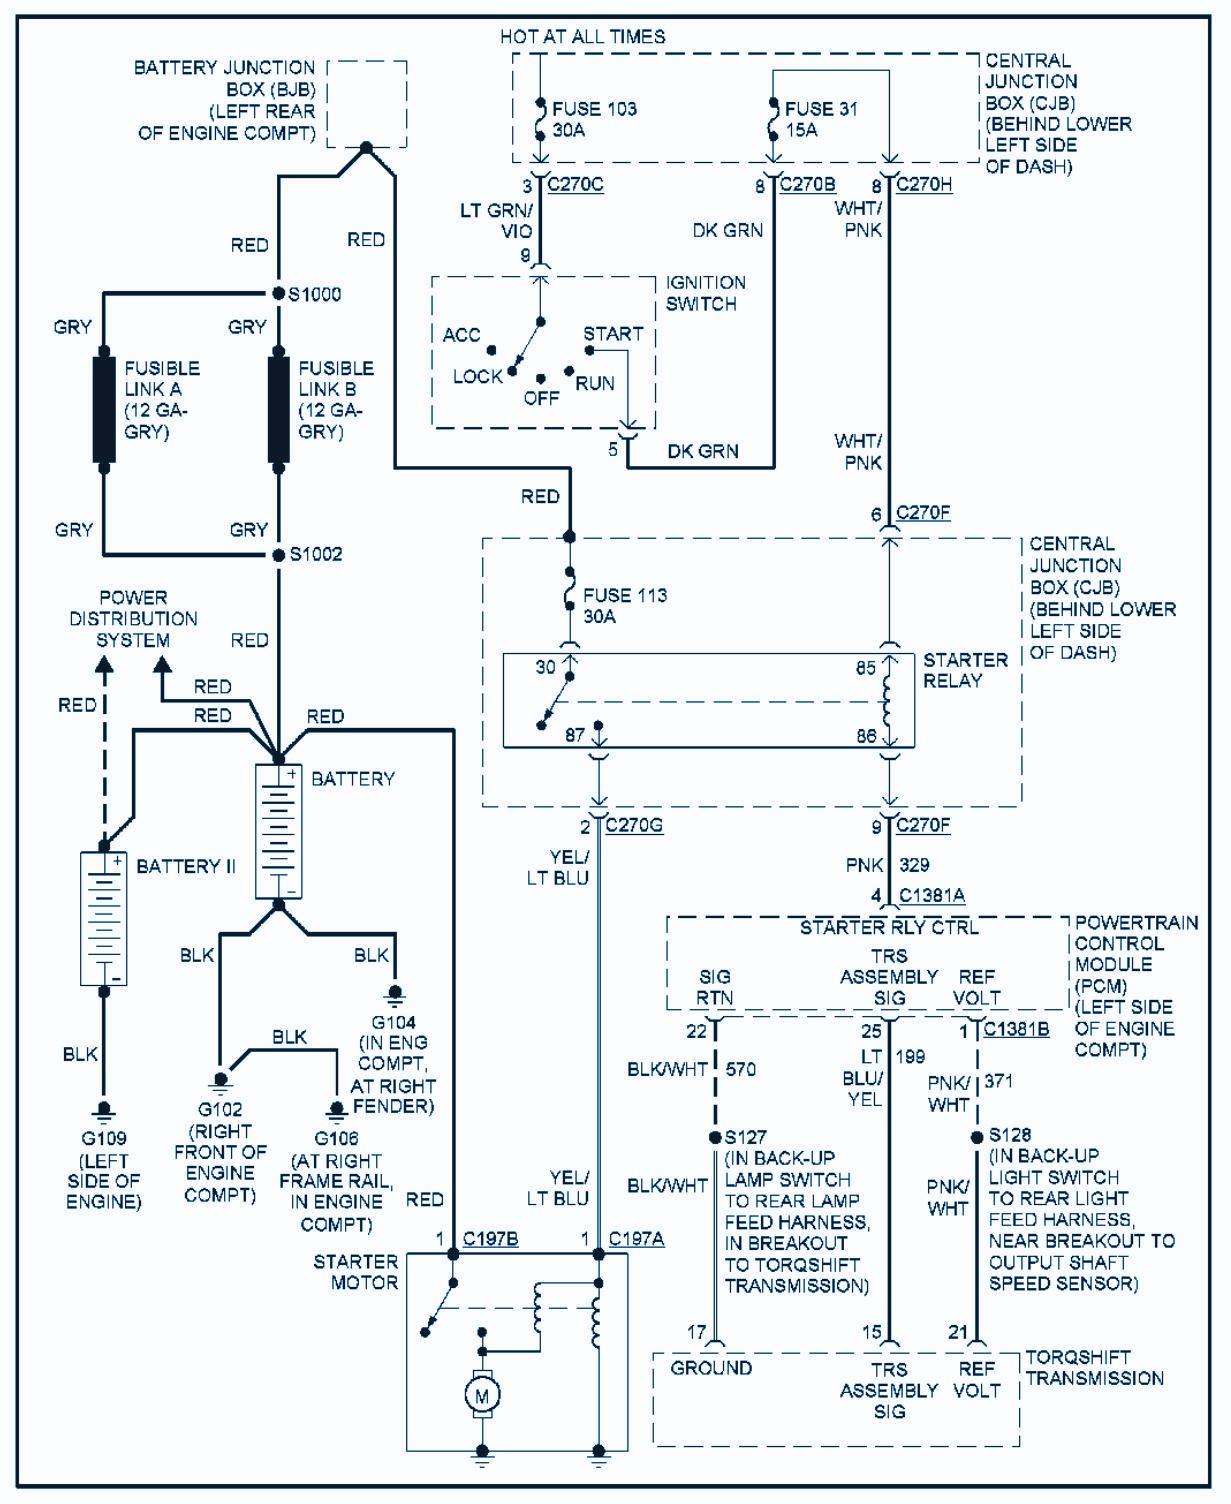 Ford car alarm wiring diagram driverlayer search engine